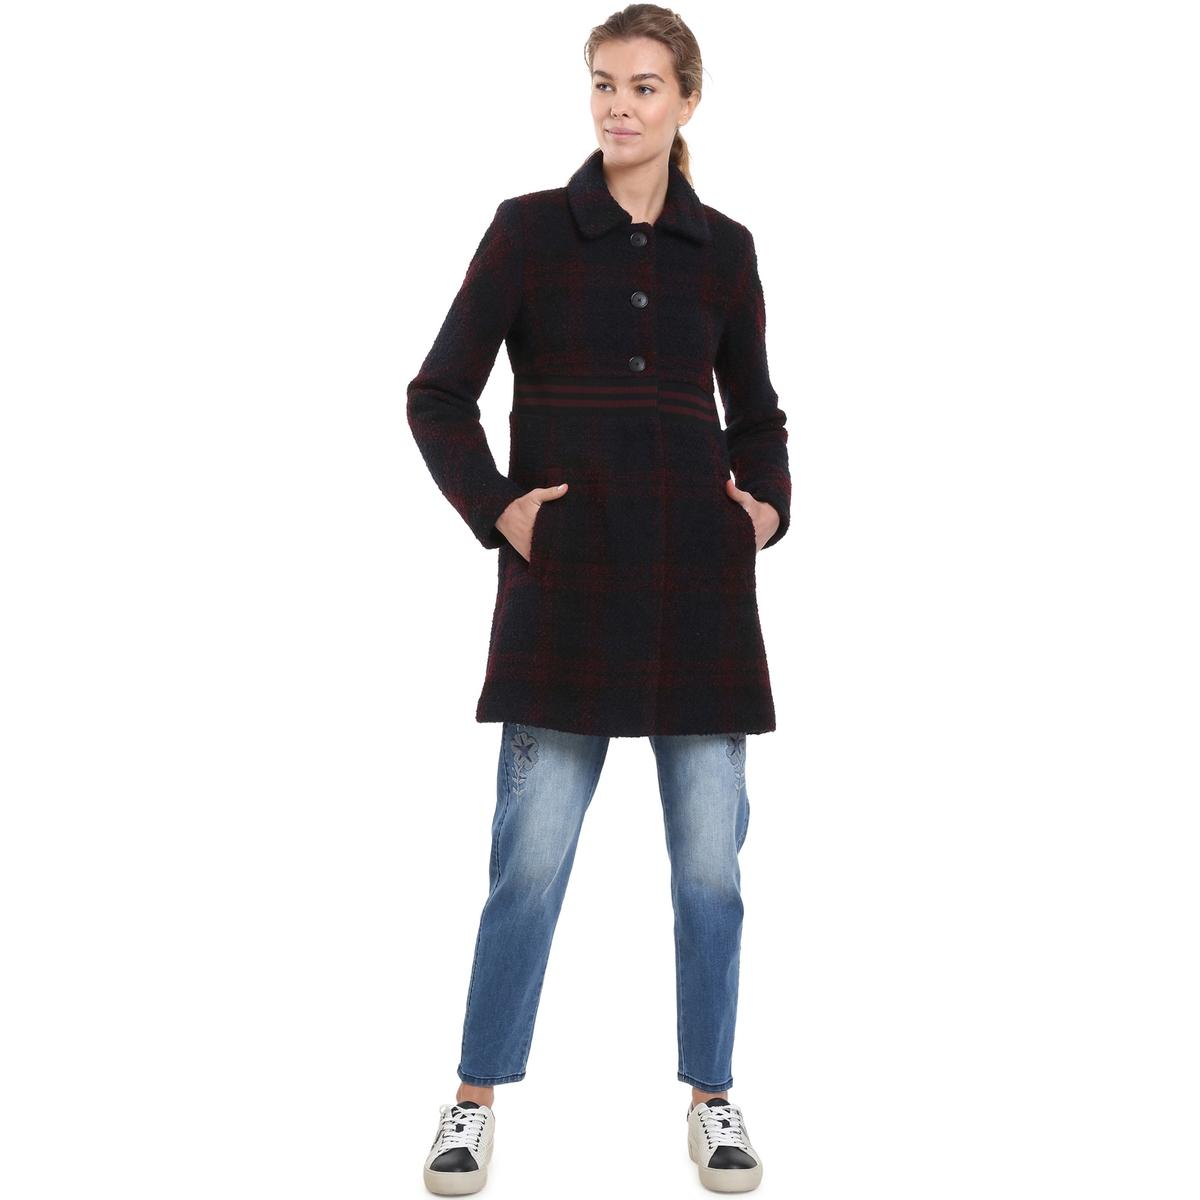 Abrigo de lana mezclada a cuadros